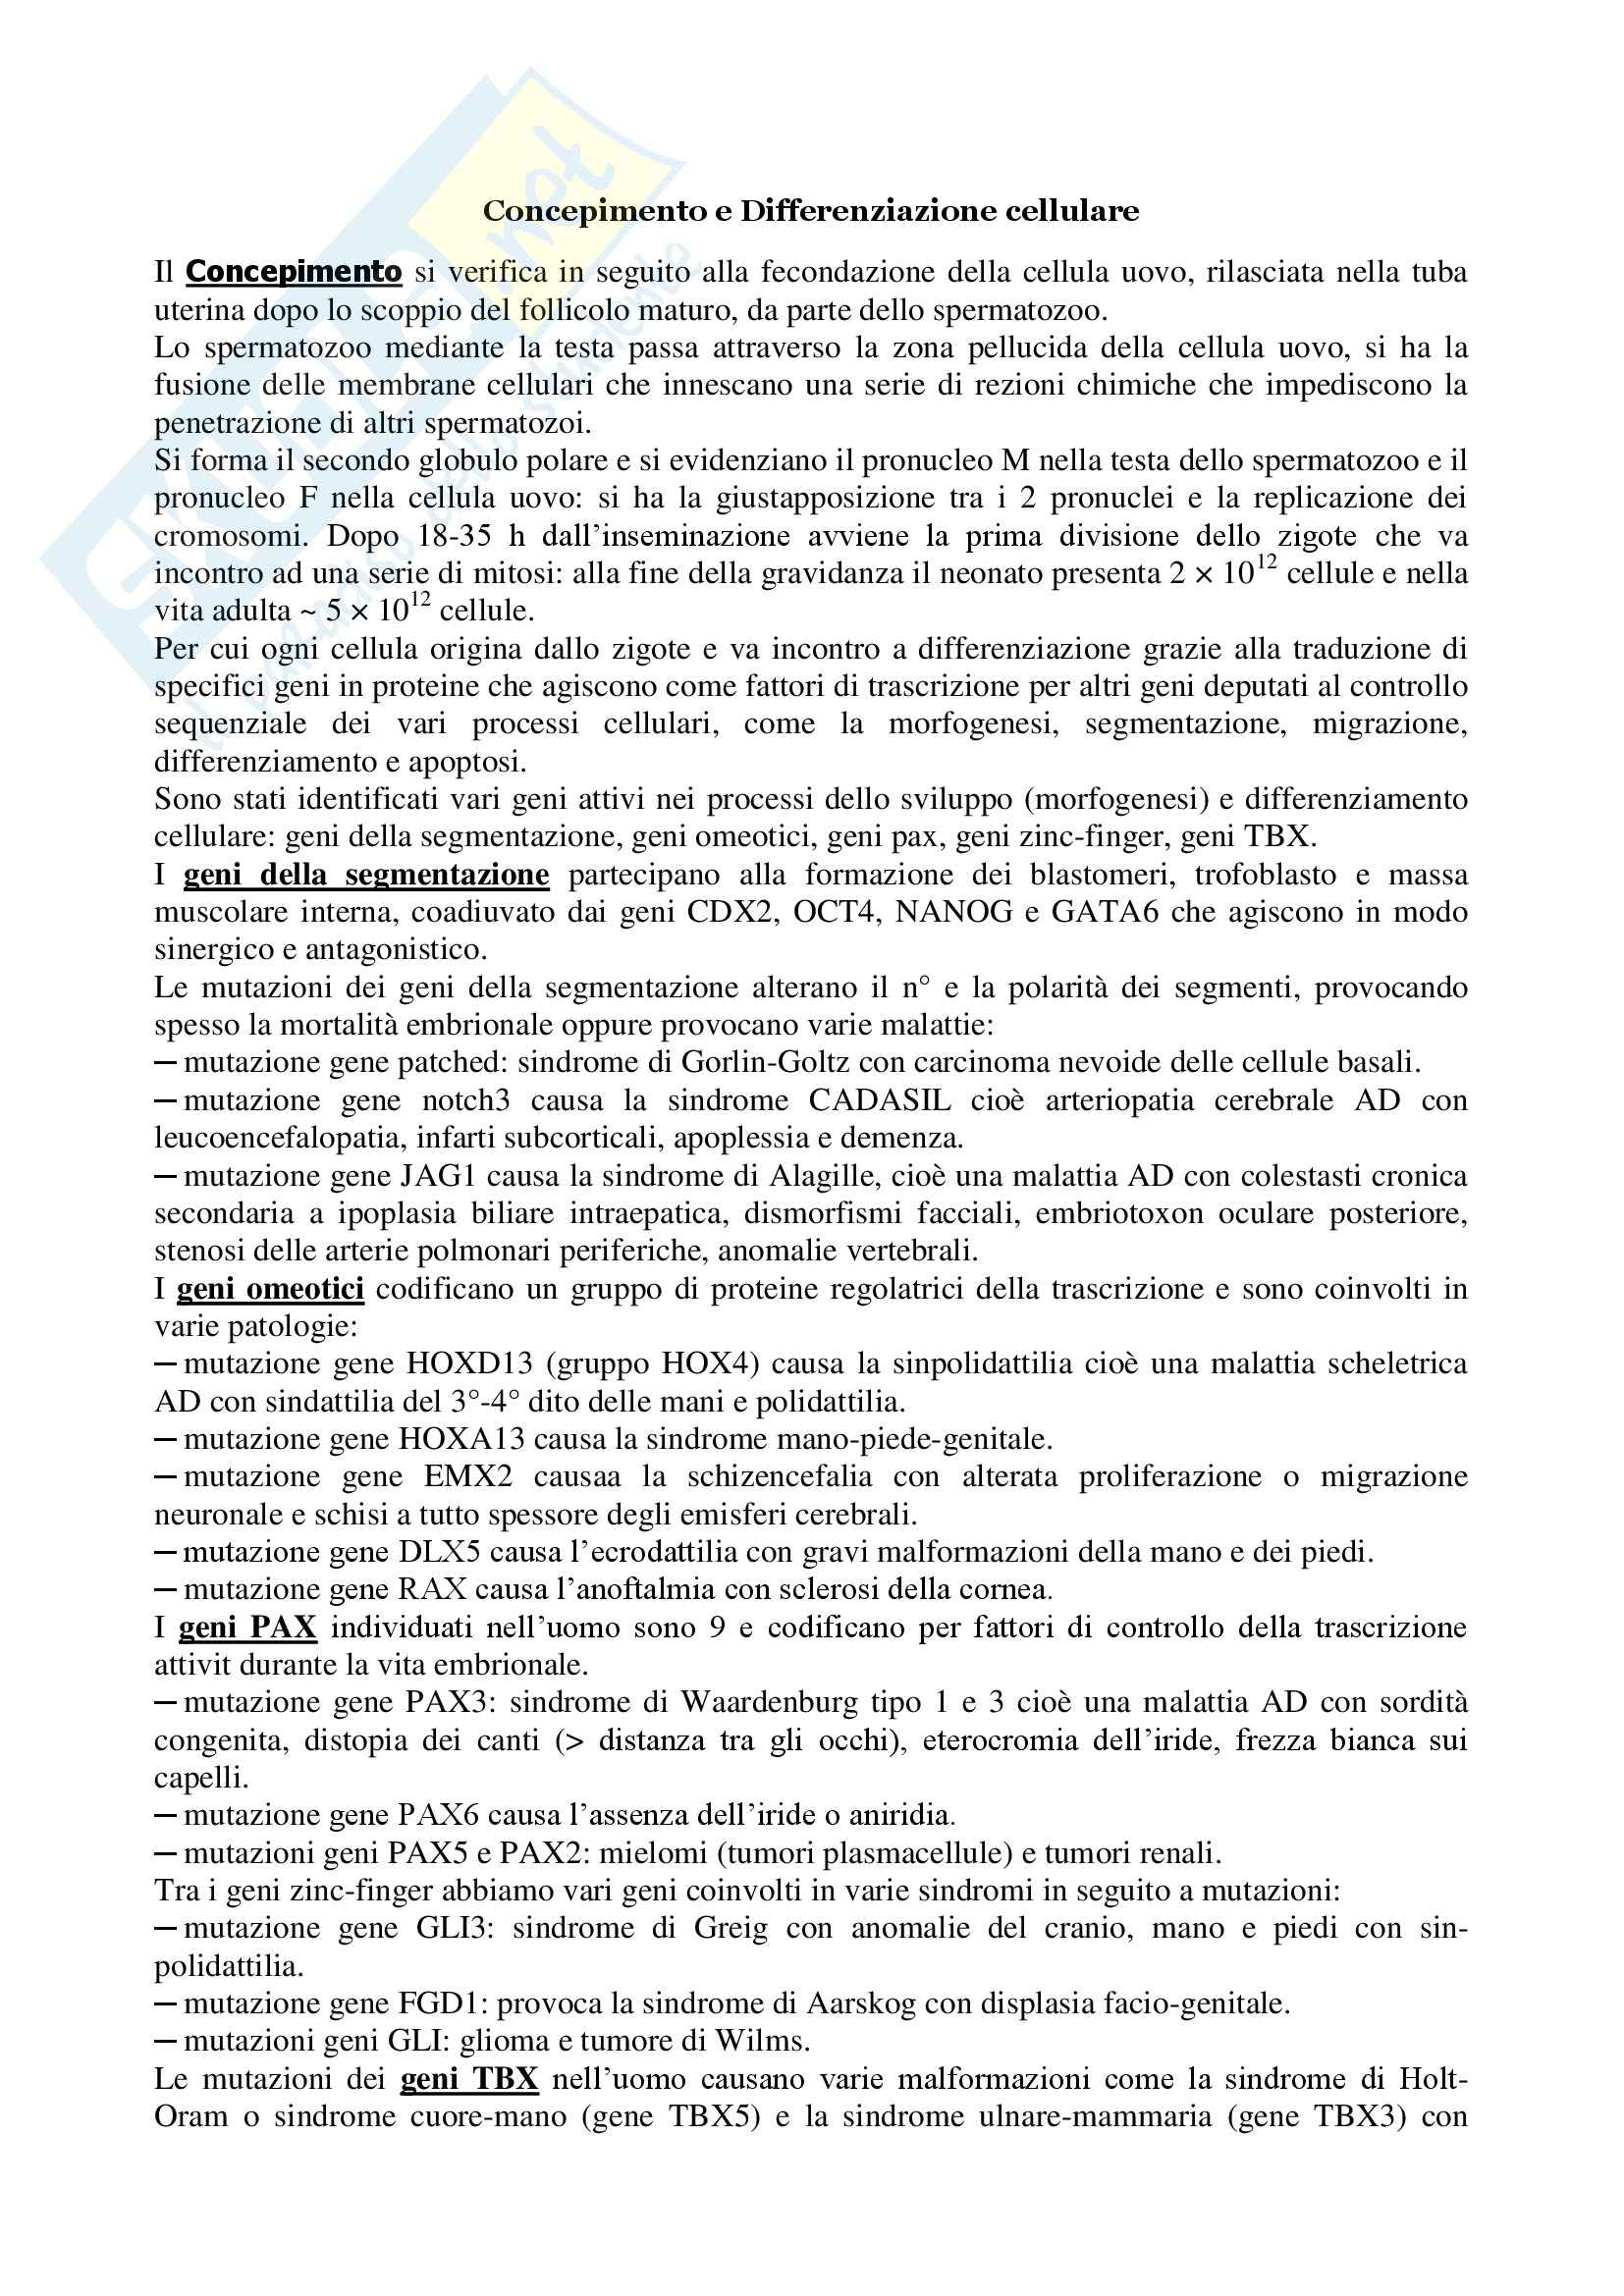 dispensa F. Pietropaolo Ginecologia e Ostetricia